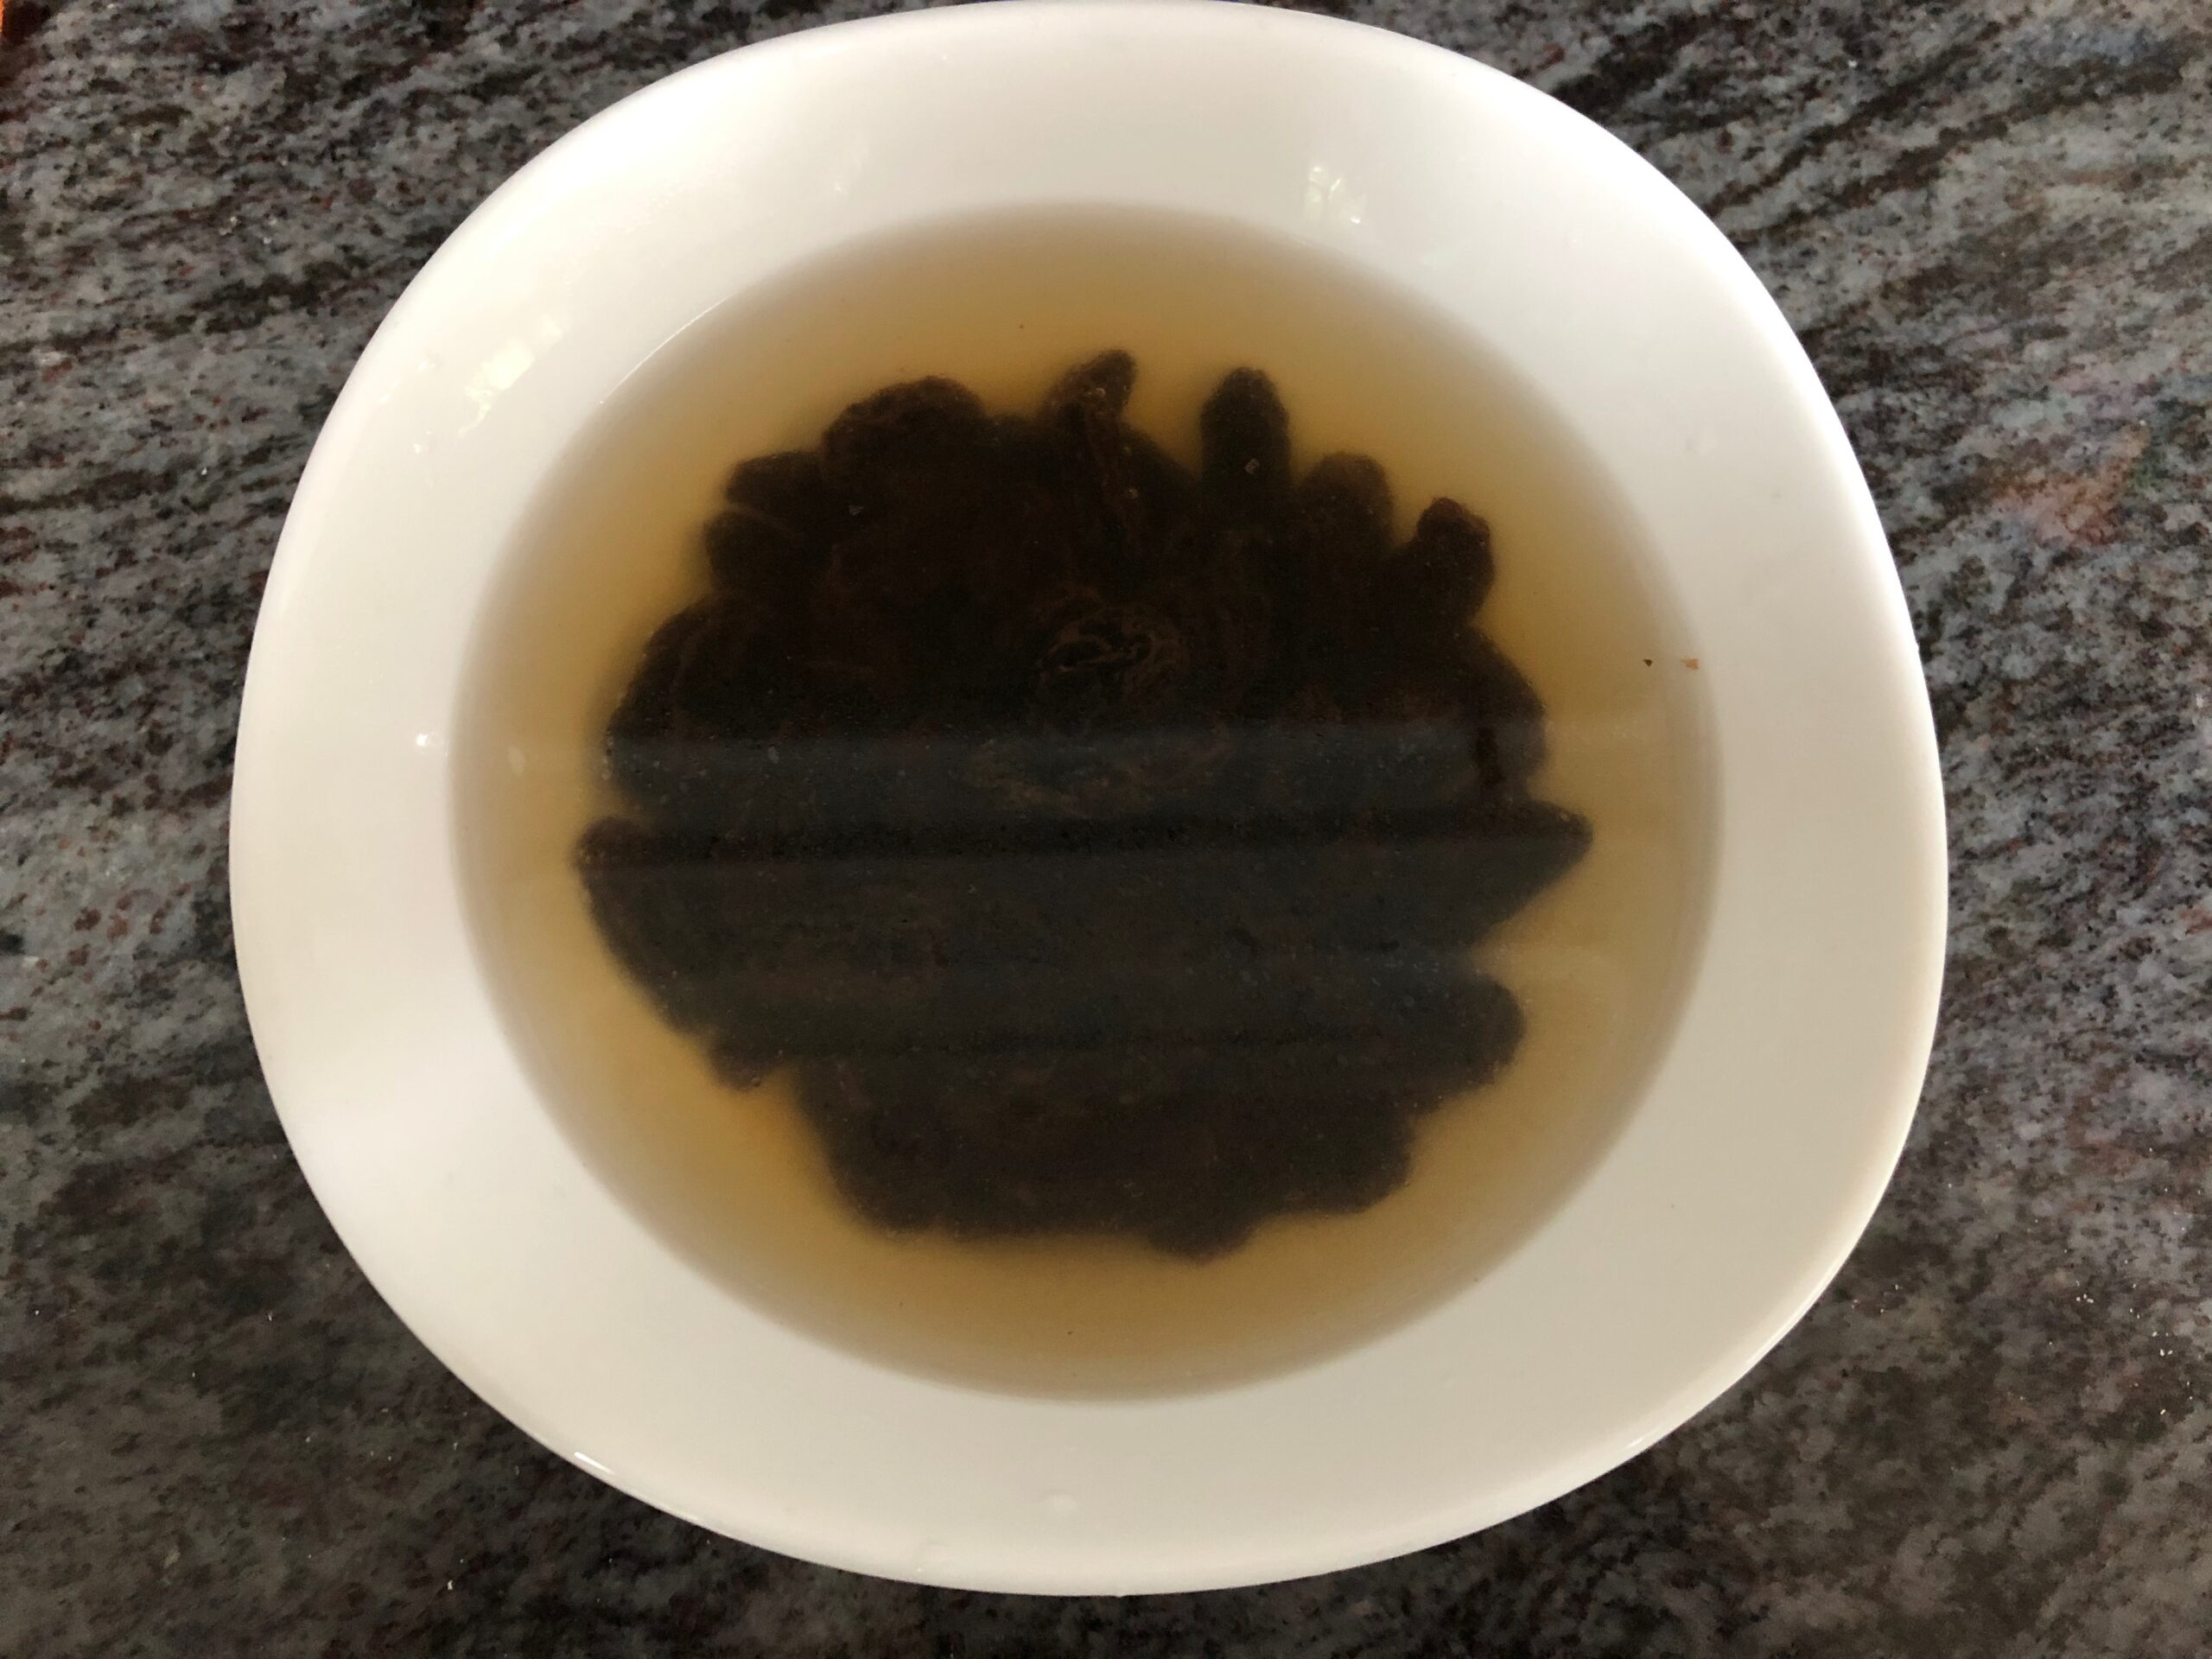 soaking raisins